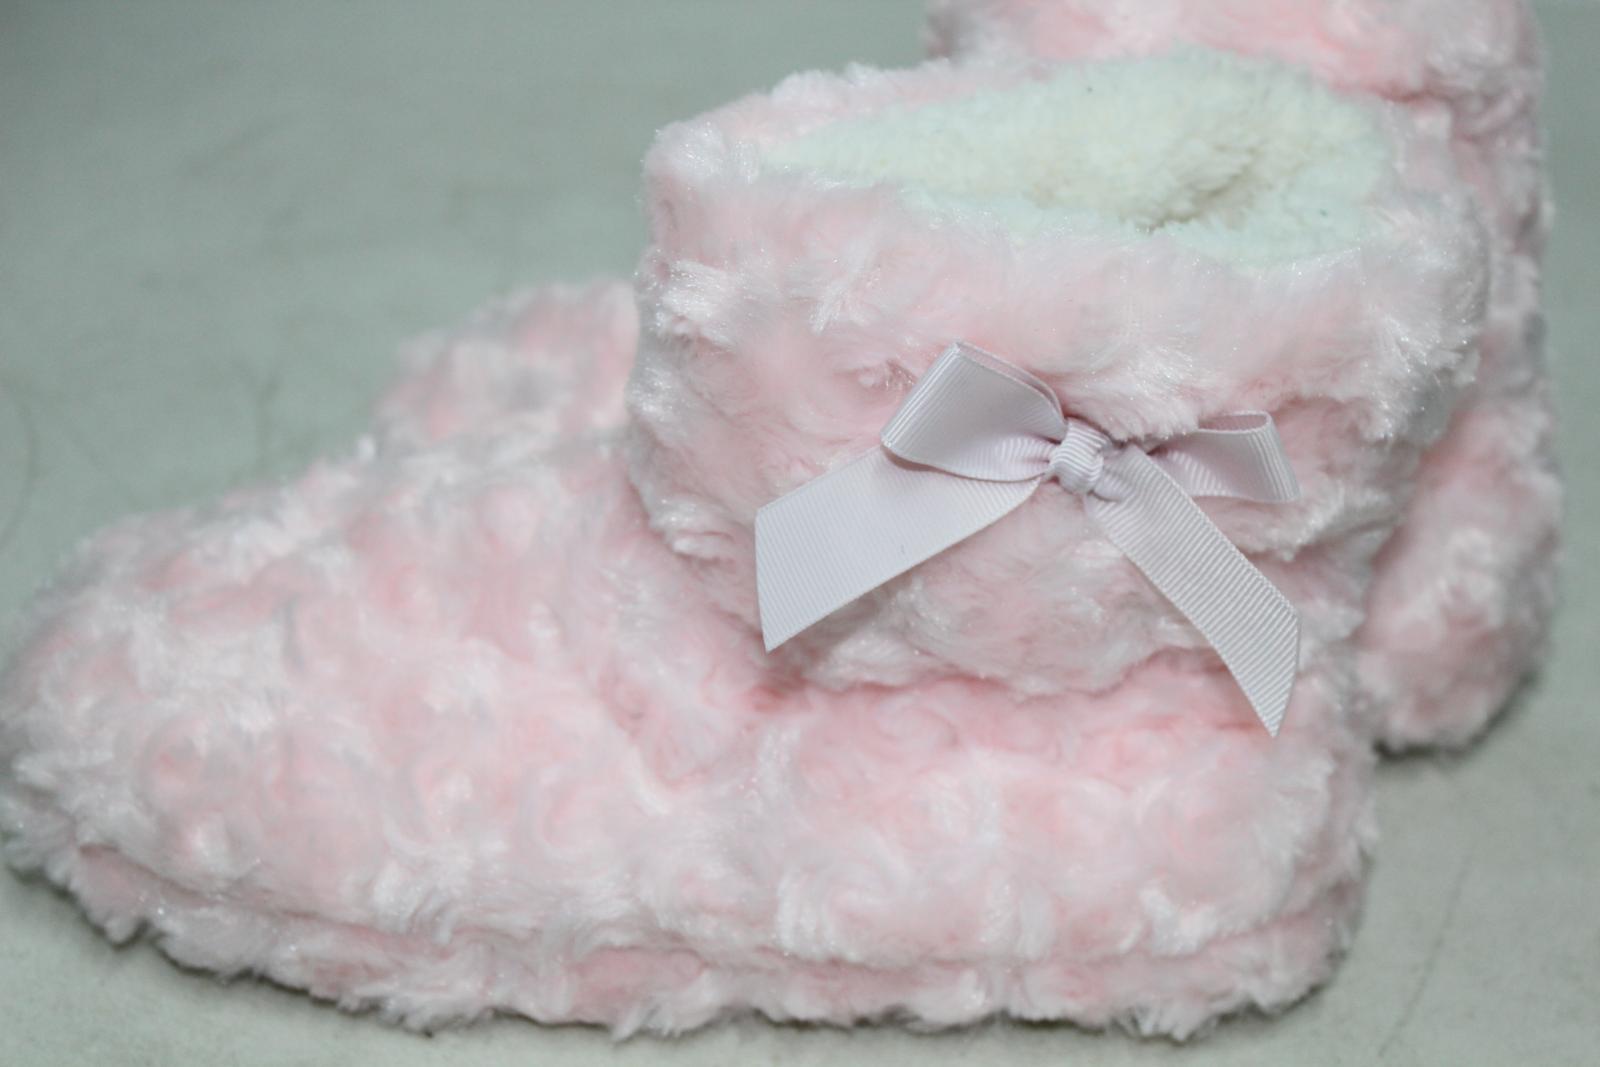 CHIC PRINCESS Girls Pink Fluffy Winter Warm Slipper Shoe Boots UK5 EU38 BNWT 5